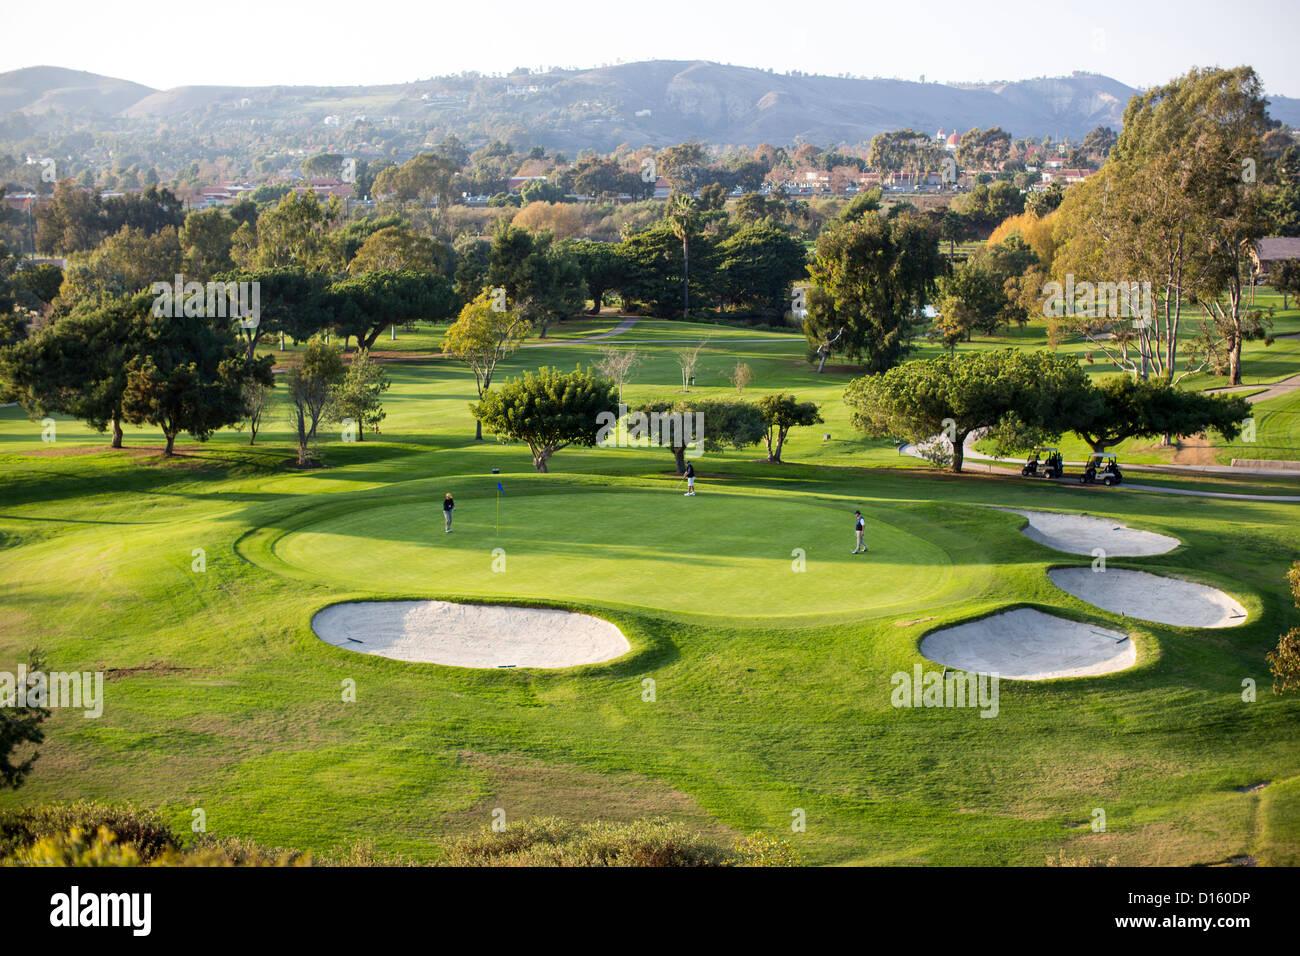 Three golfers putt on a green at the San Juan Hills golf course in San Juan Capistrano, California. - Stock Image